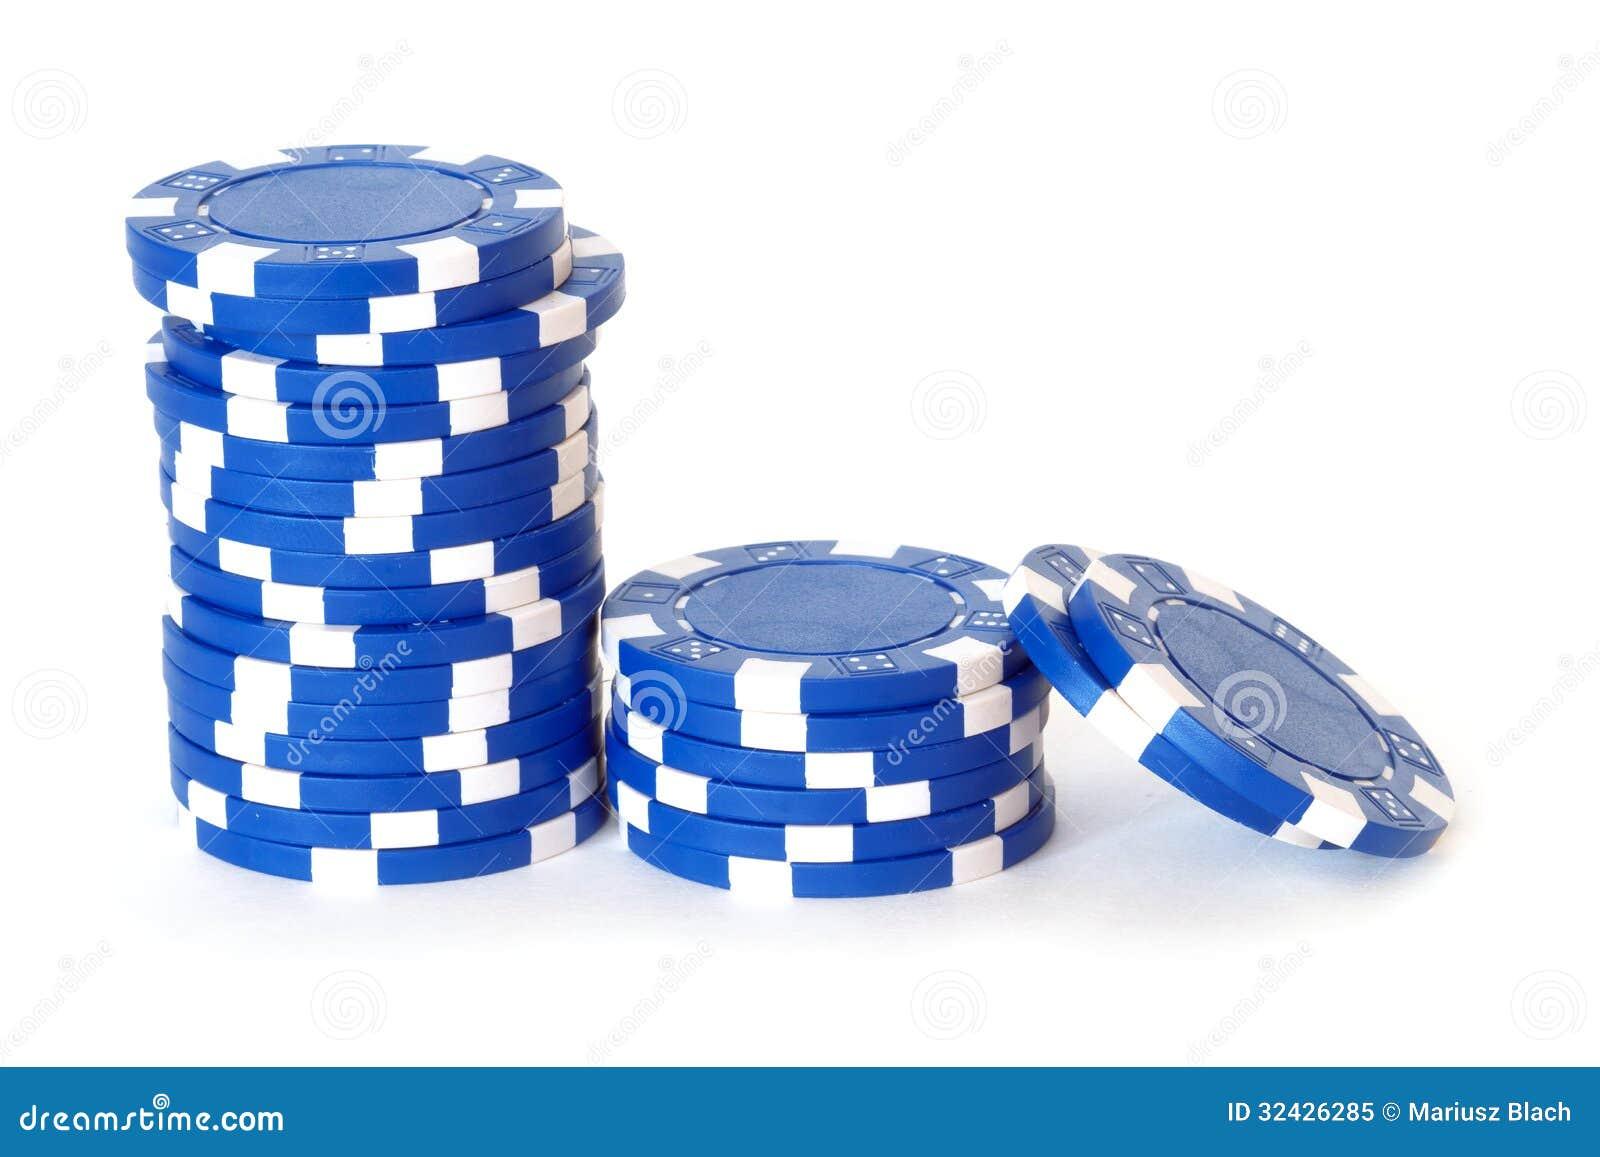 Entertainment poker web casino 12